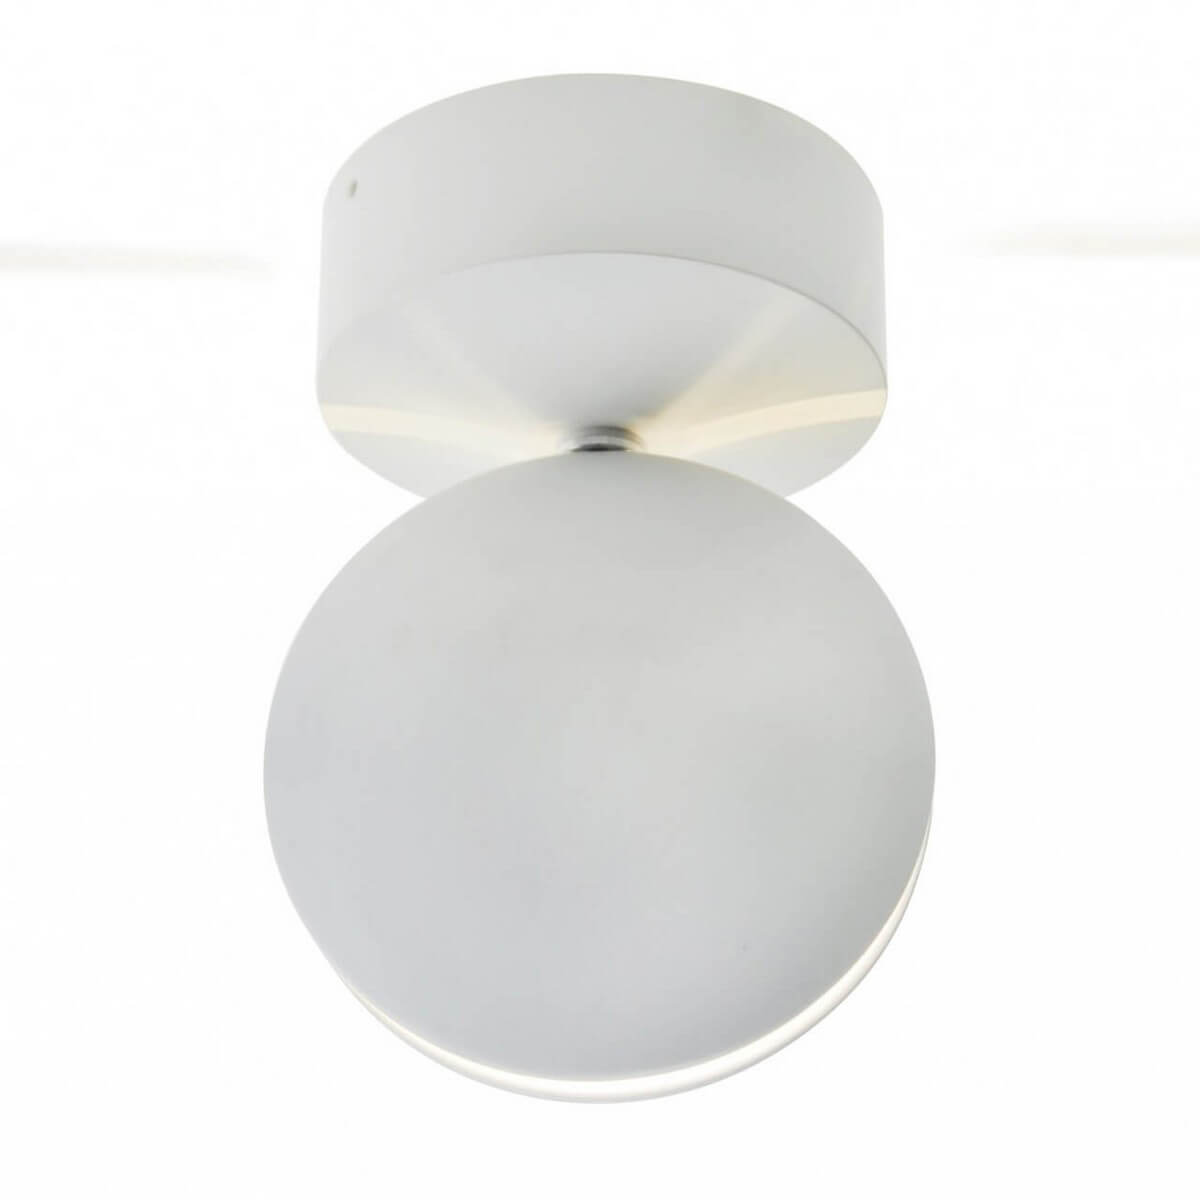 Светильник Kink Light 08574,01(4000К) Ореон